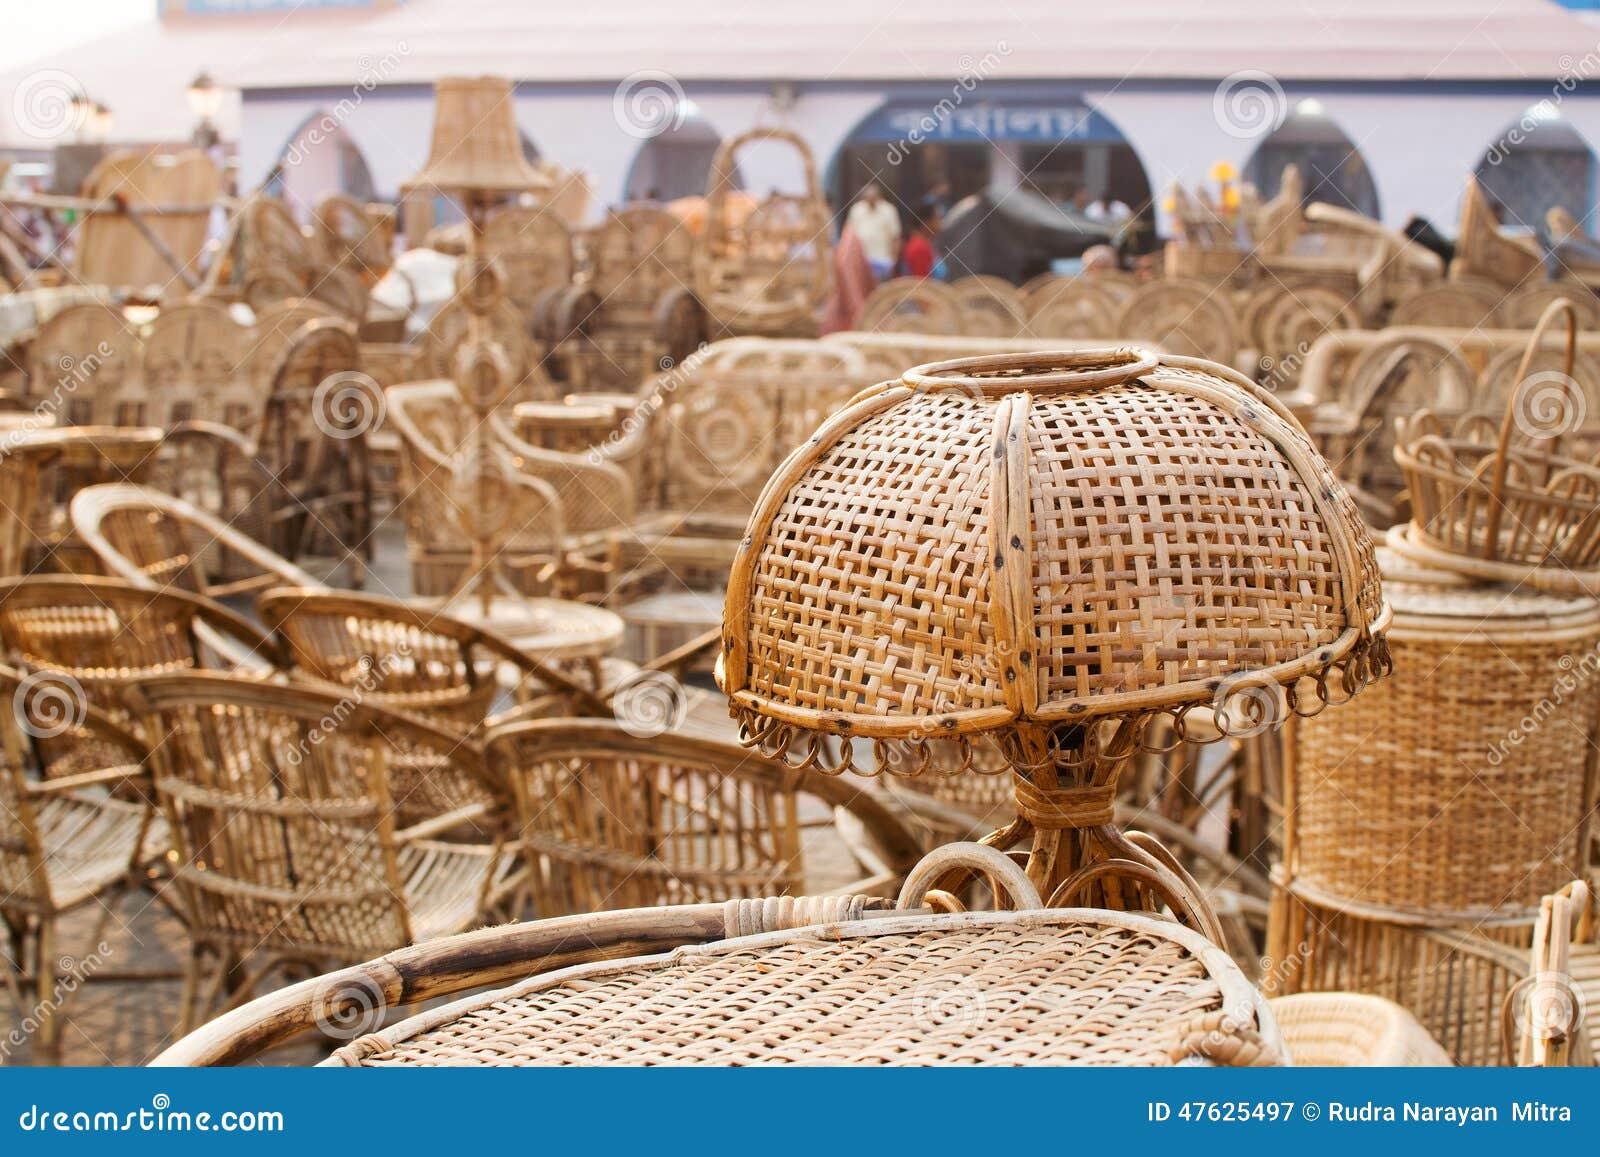 Cane Furnitures Indian Handicrafts Fair Editorial